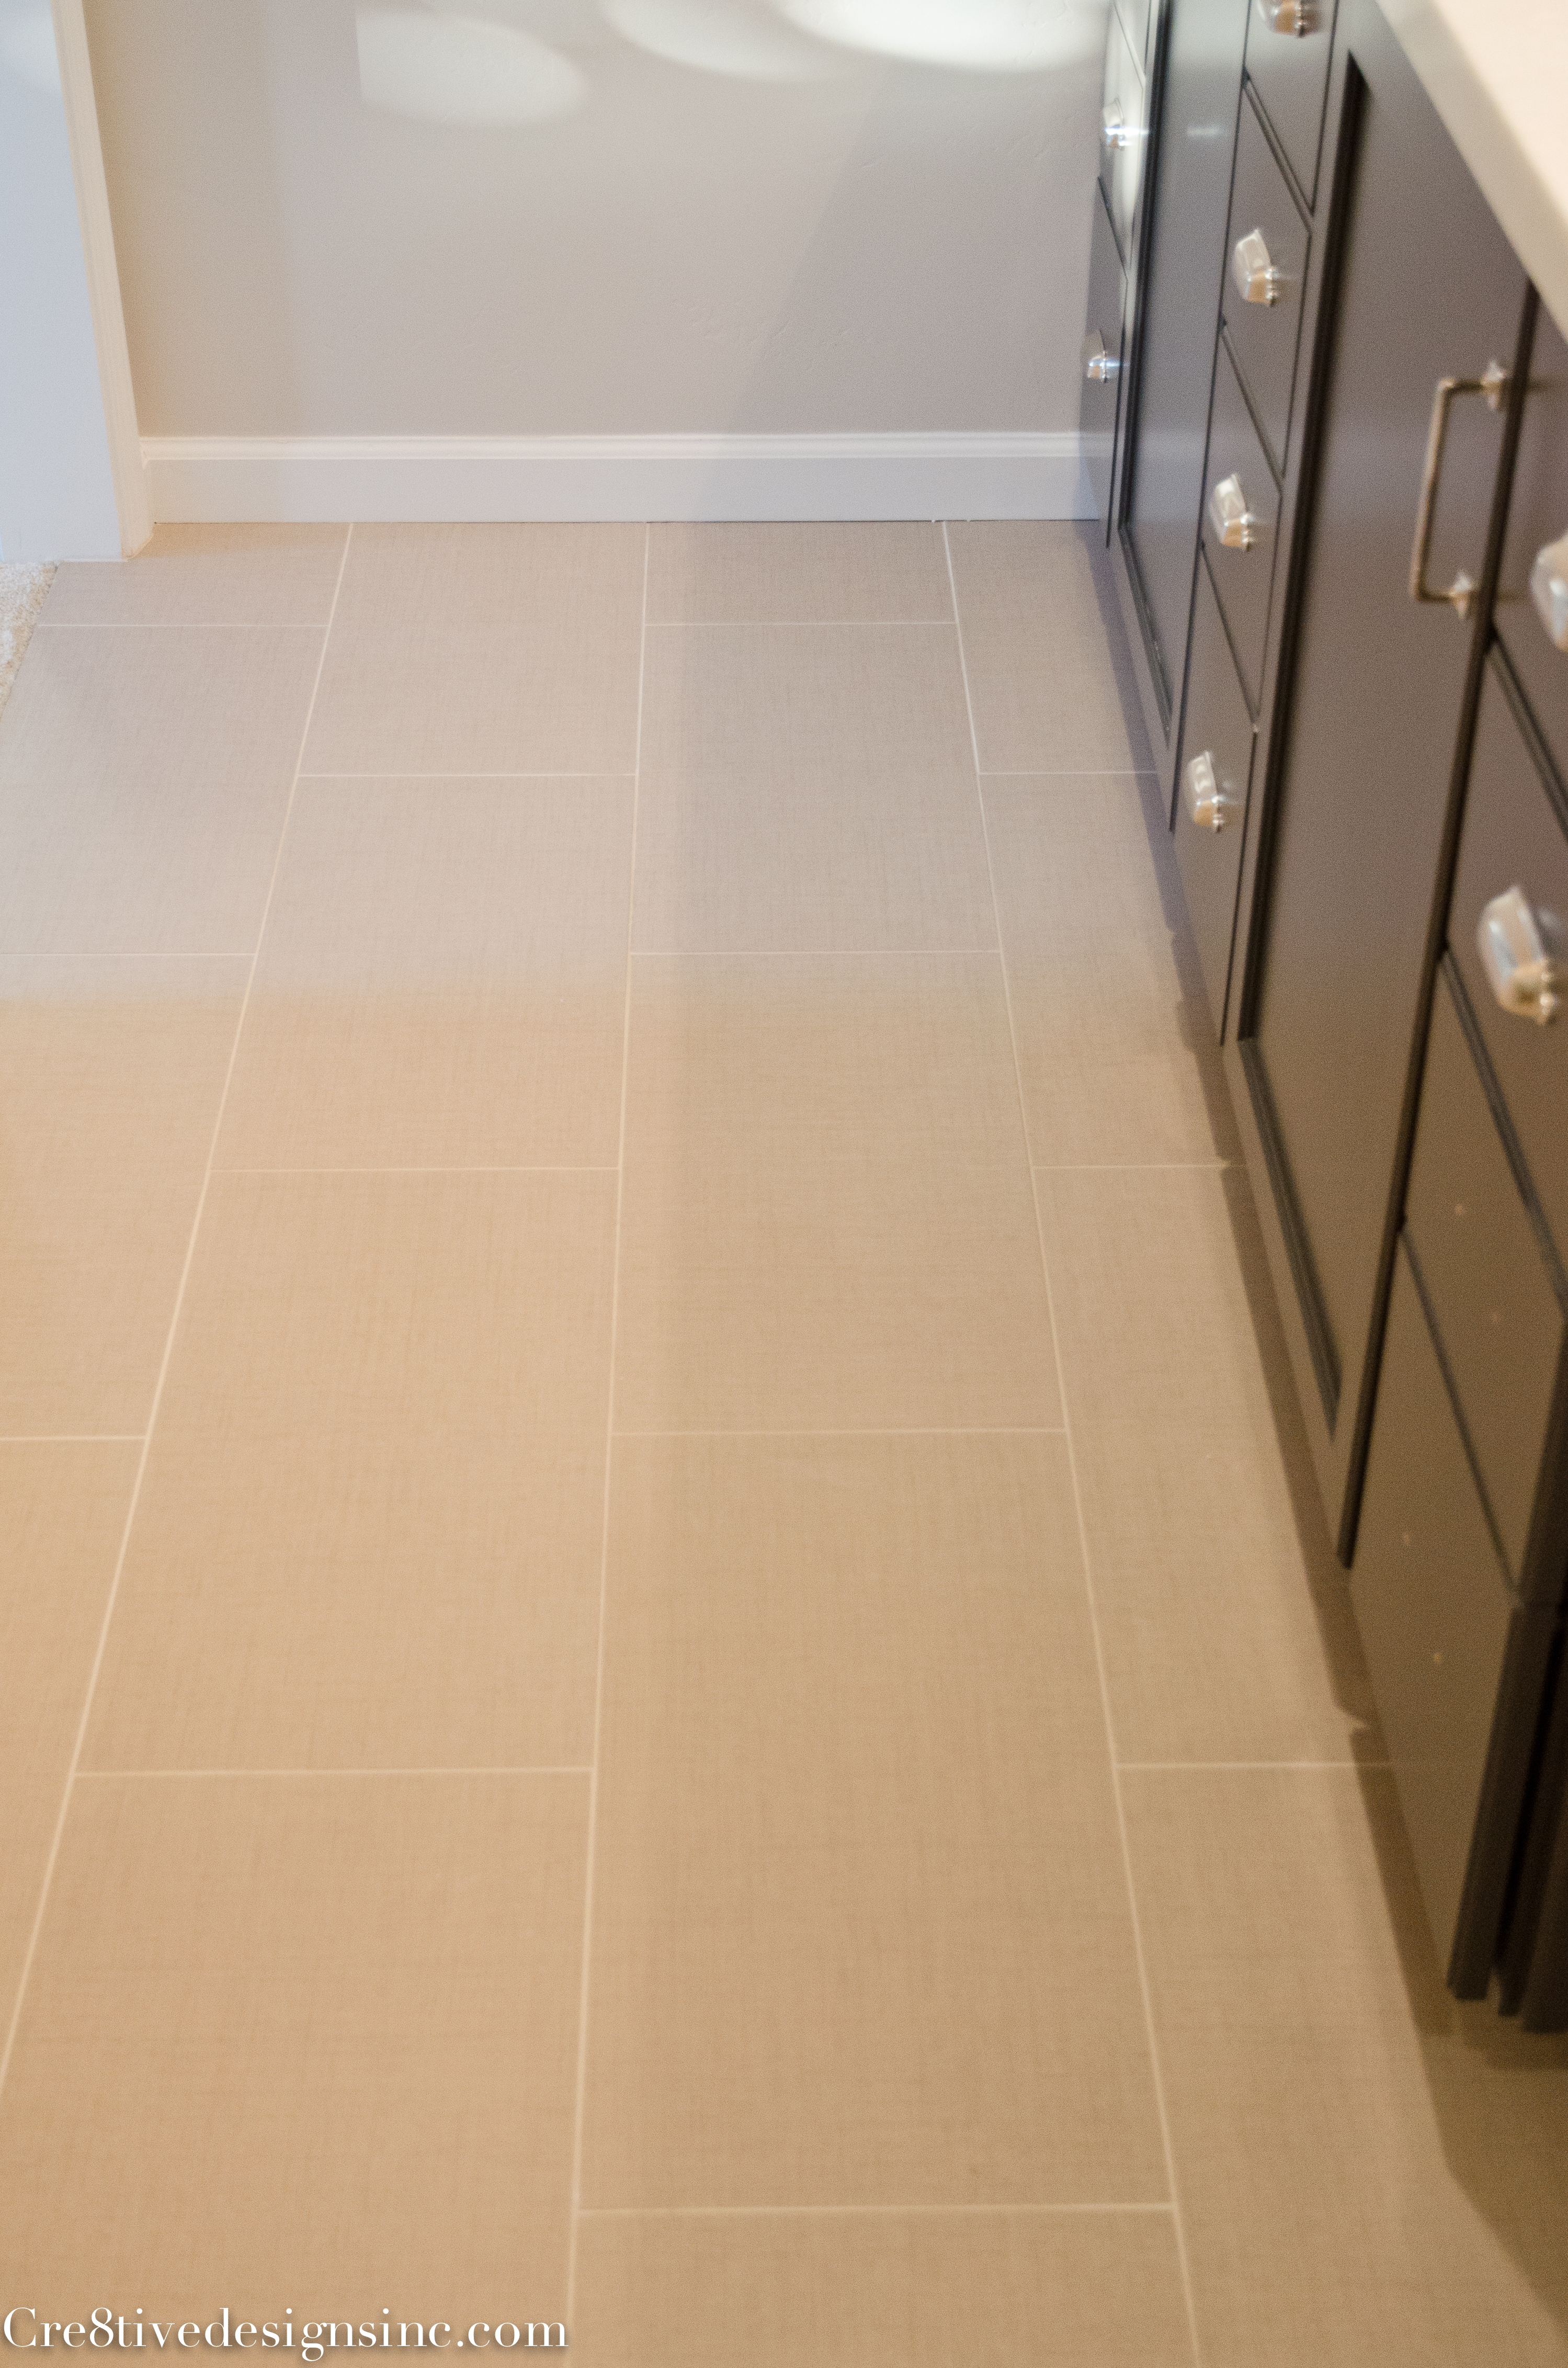 Bath Flooring. Free Tiles Flooring And Remodeling Flooring Store ...